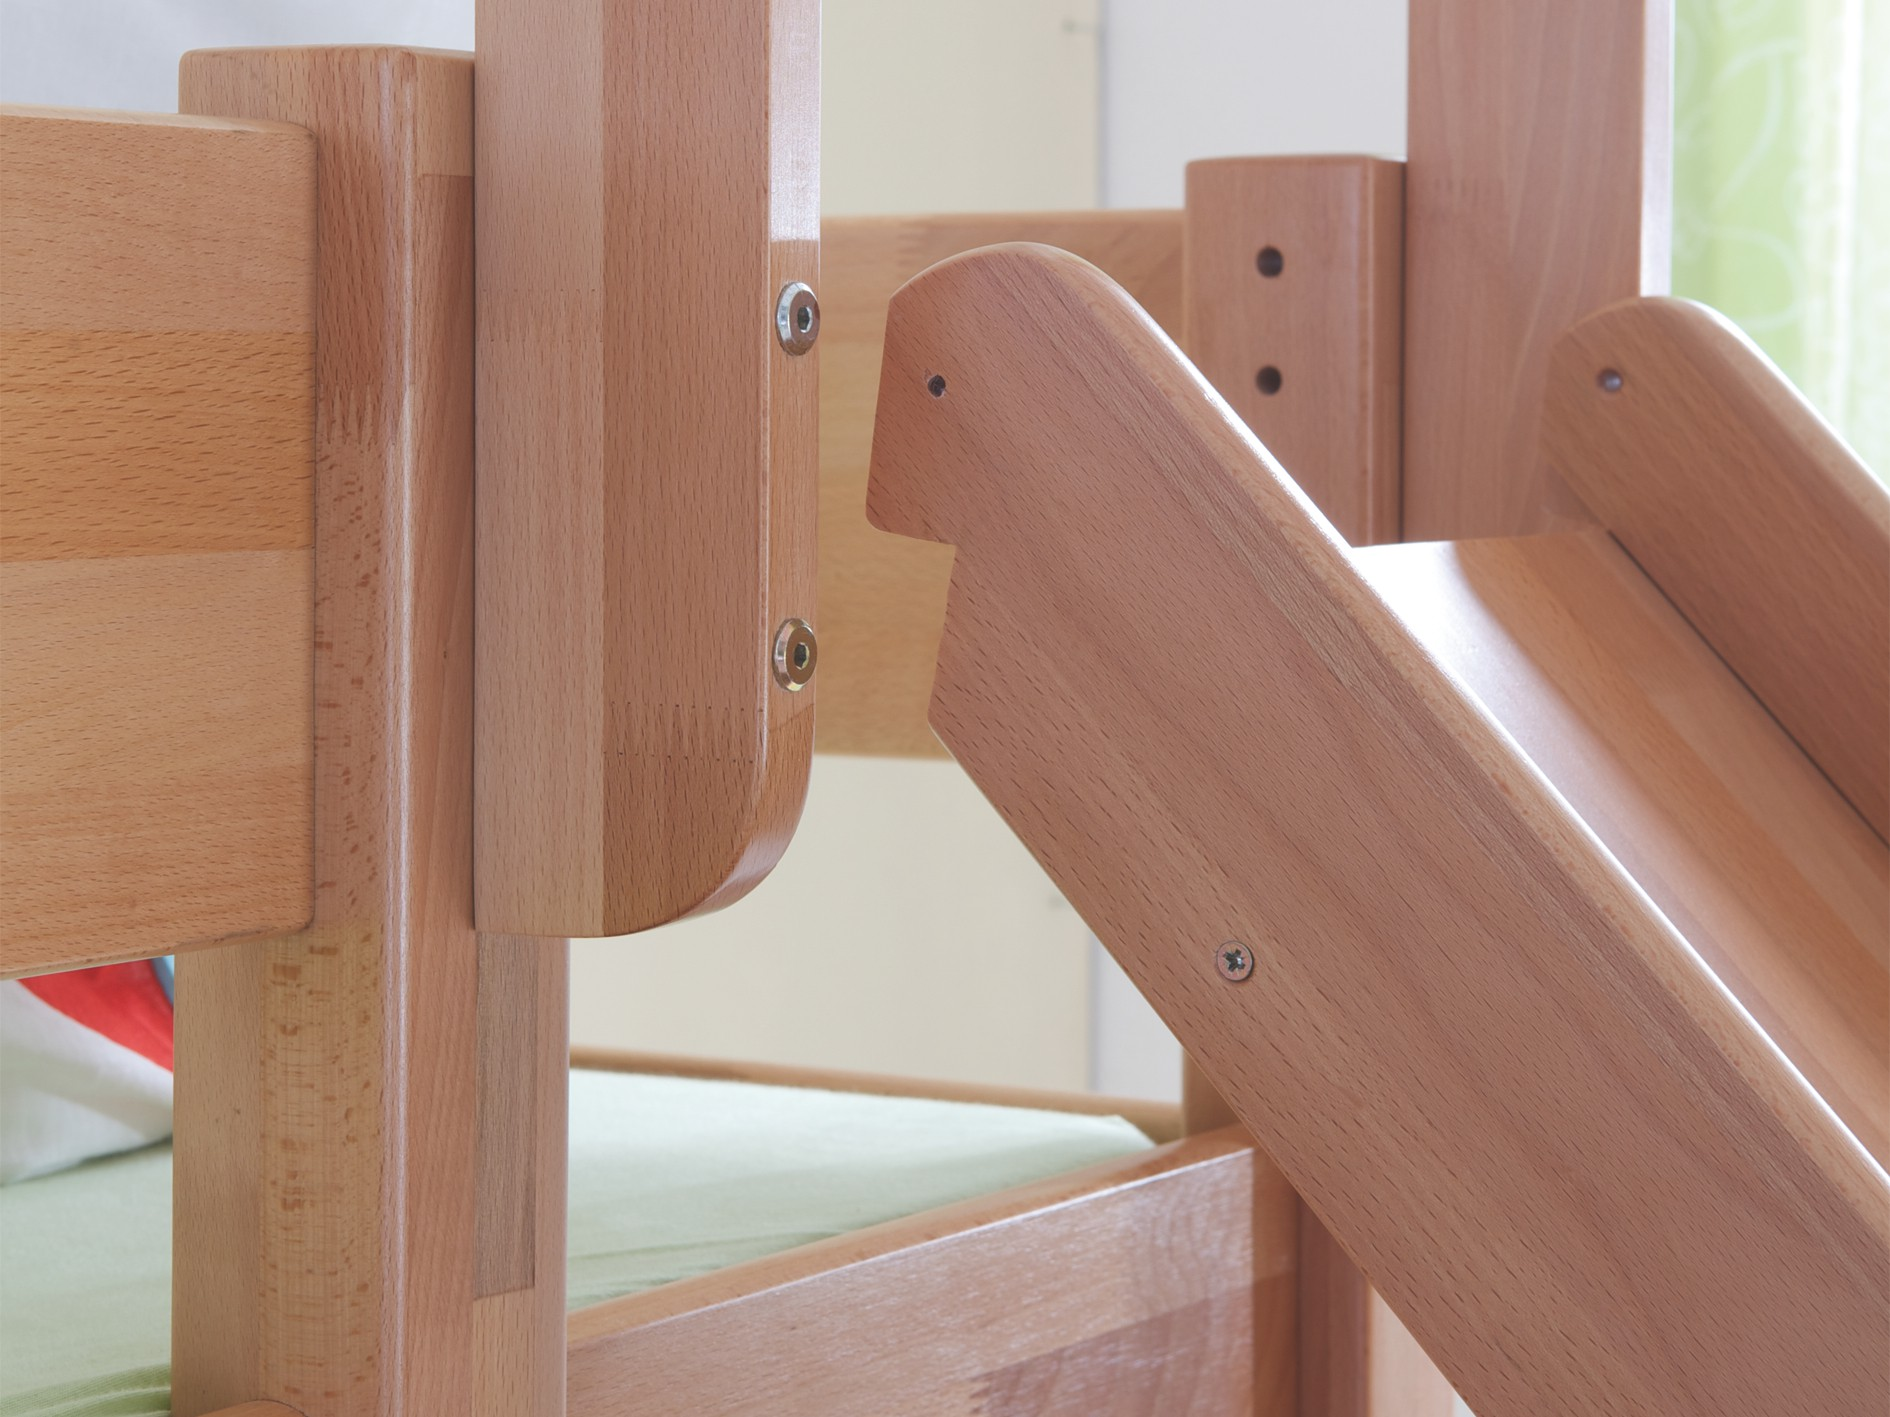 kinder stockbett buche 90x200 halbhochbett spielbett. Black Bedroom Furniture Sets. Home Design Ideas